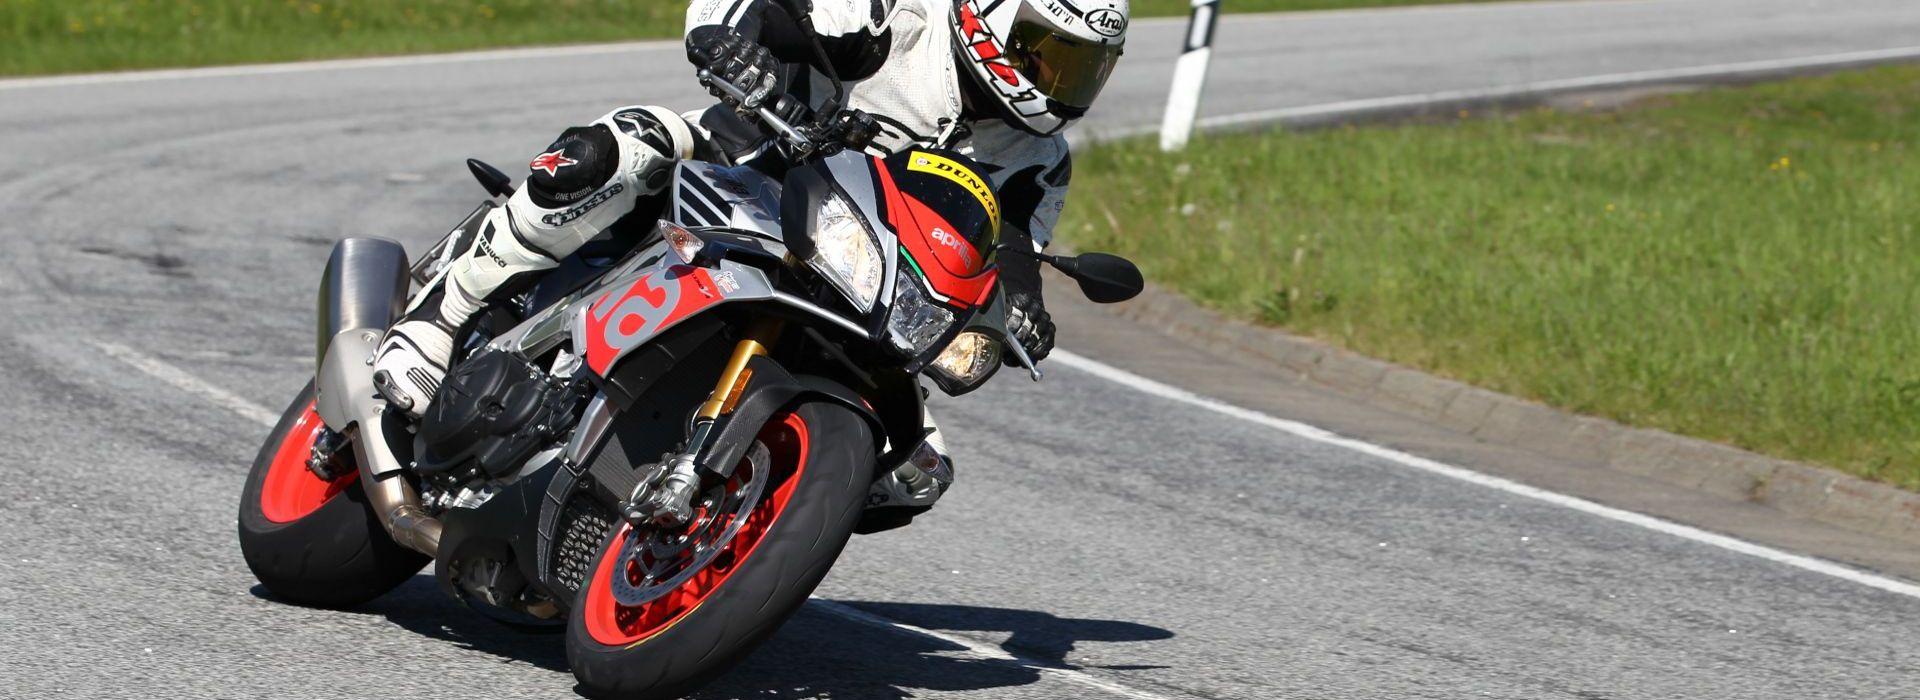 Dunlop Sport-/Touringreifen